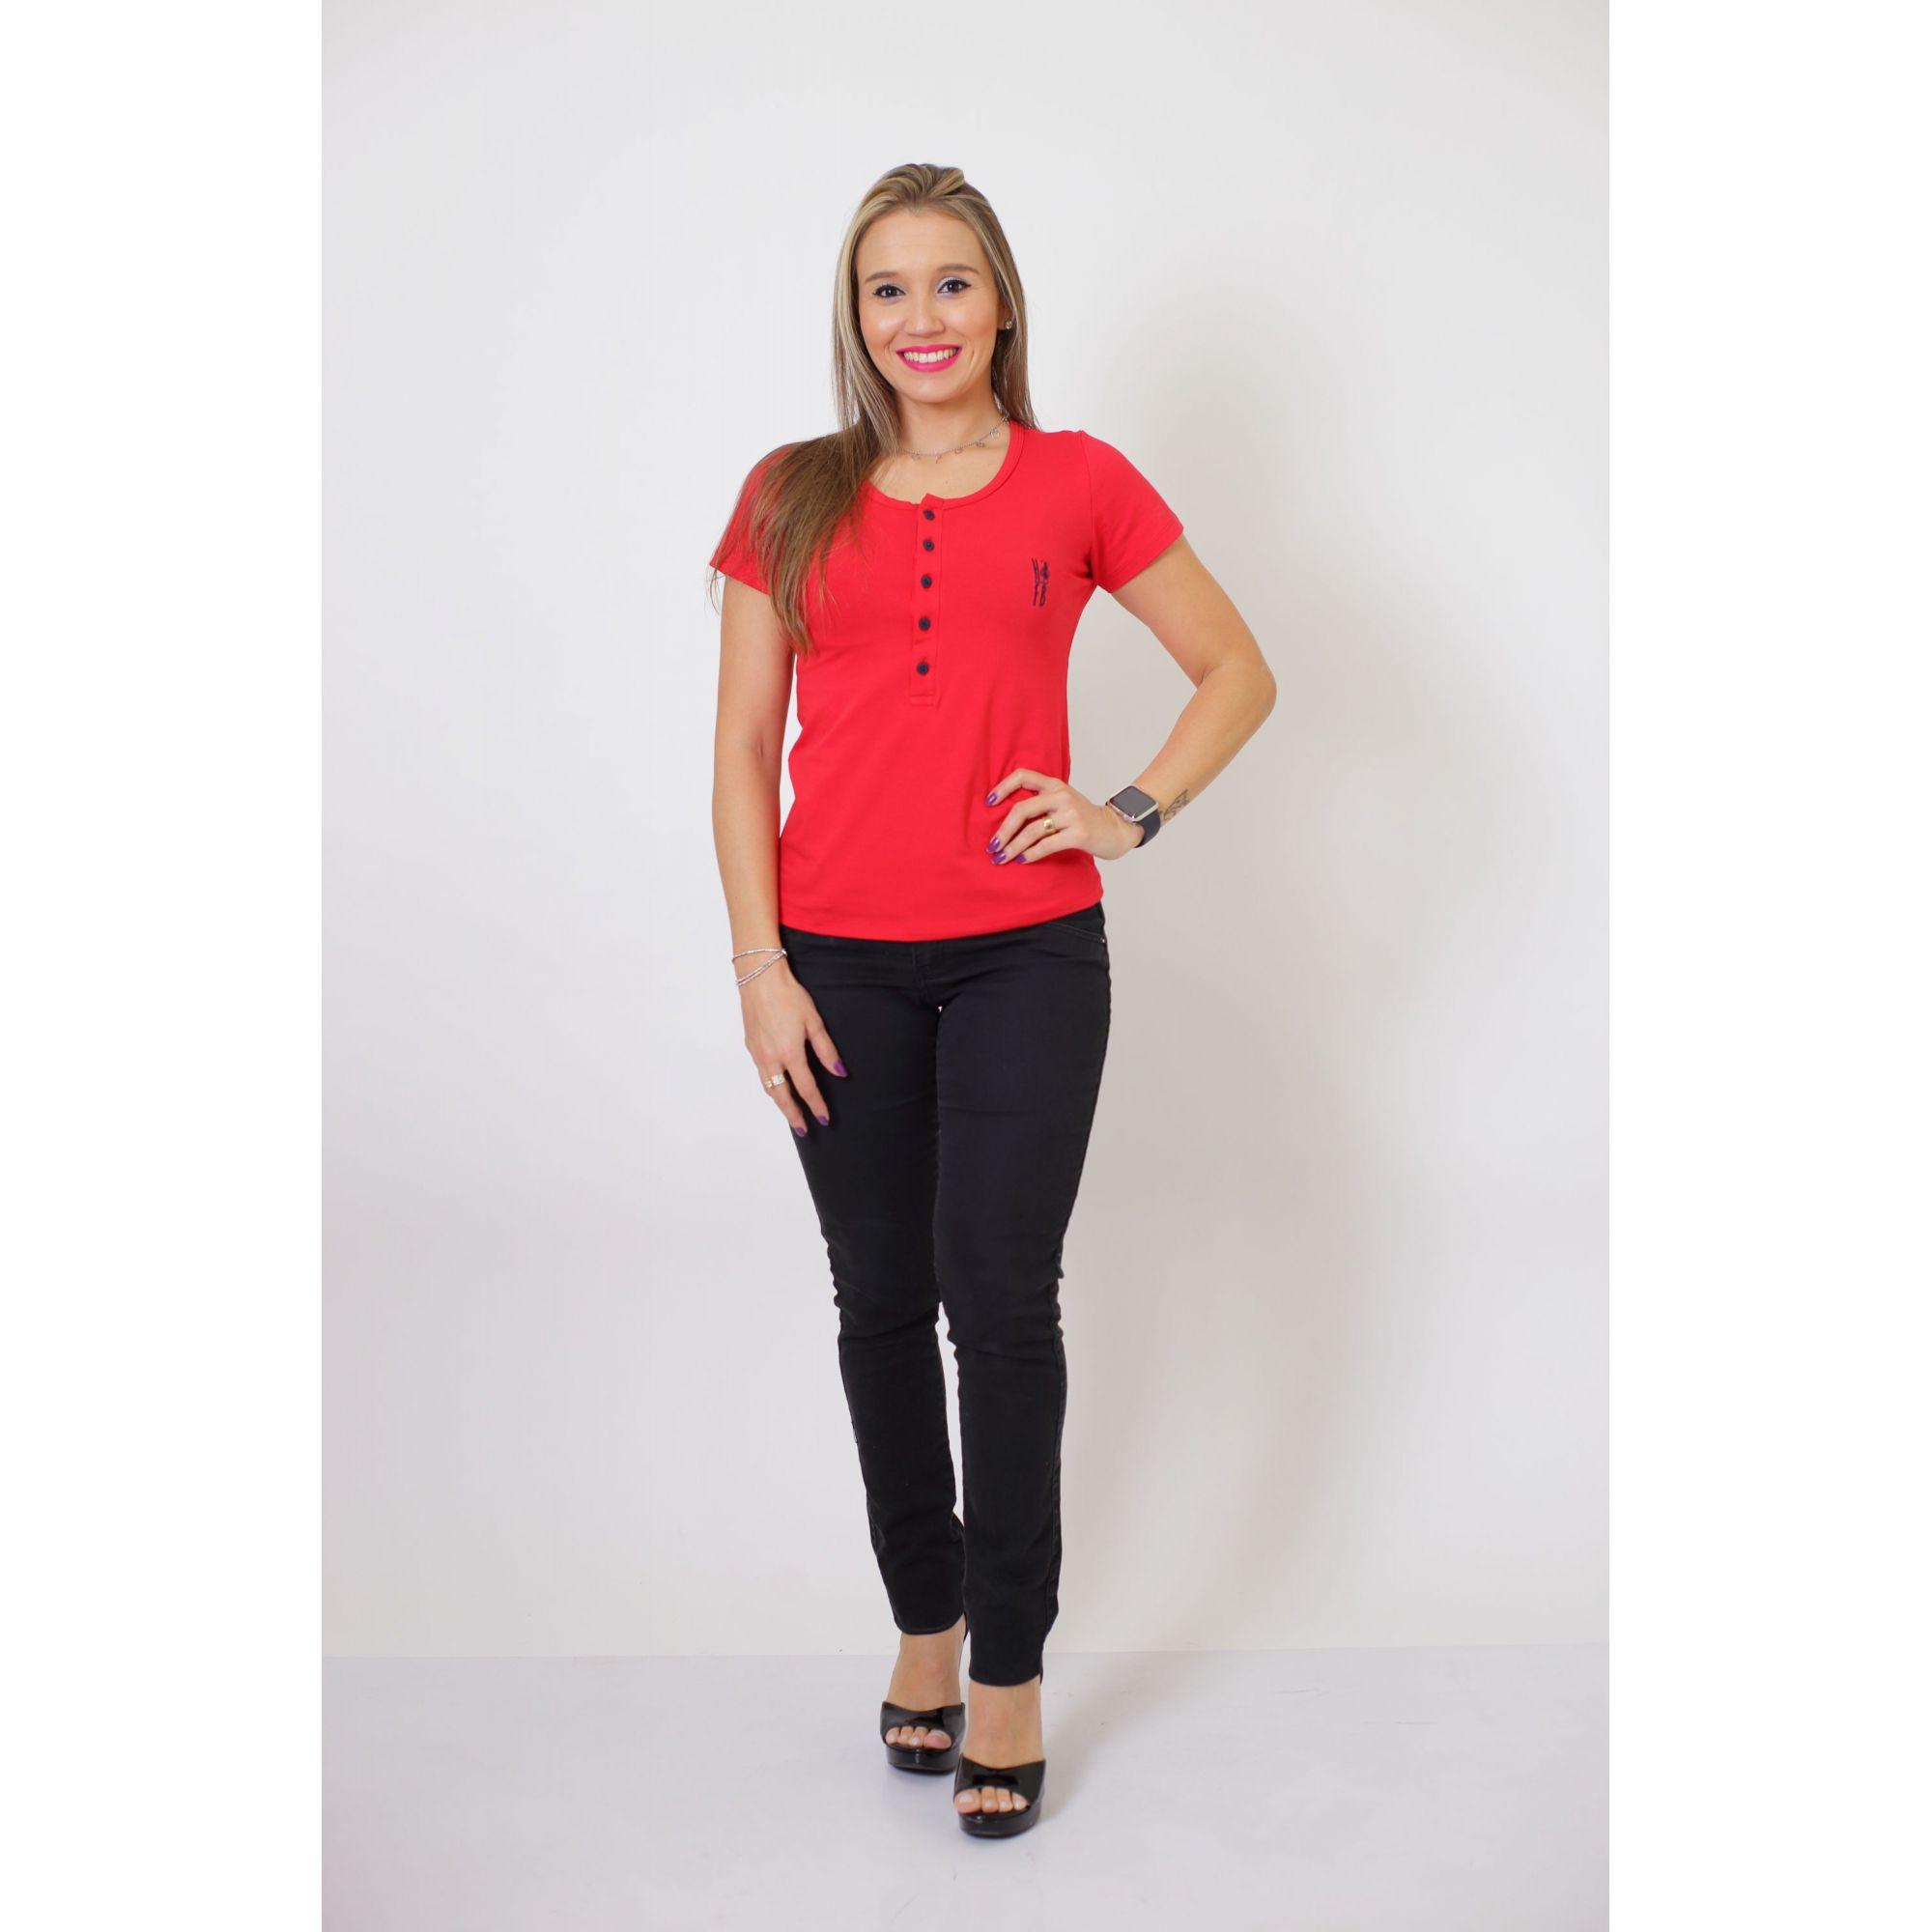 MÃE E FILHA > Kit 02 Peças - T-Shirts ou Body Henley - Vermelho [Coleção Tal Mãe Tal Filha]  - Heitor Fashion Brazil